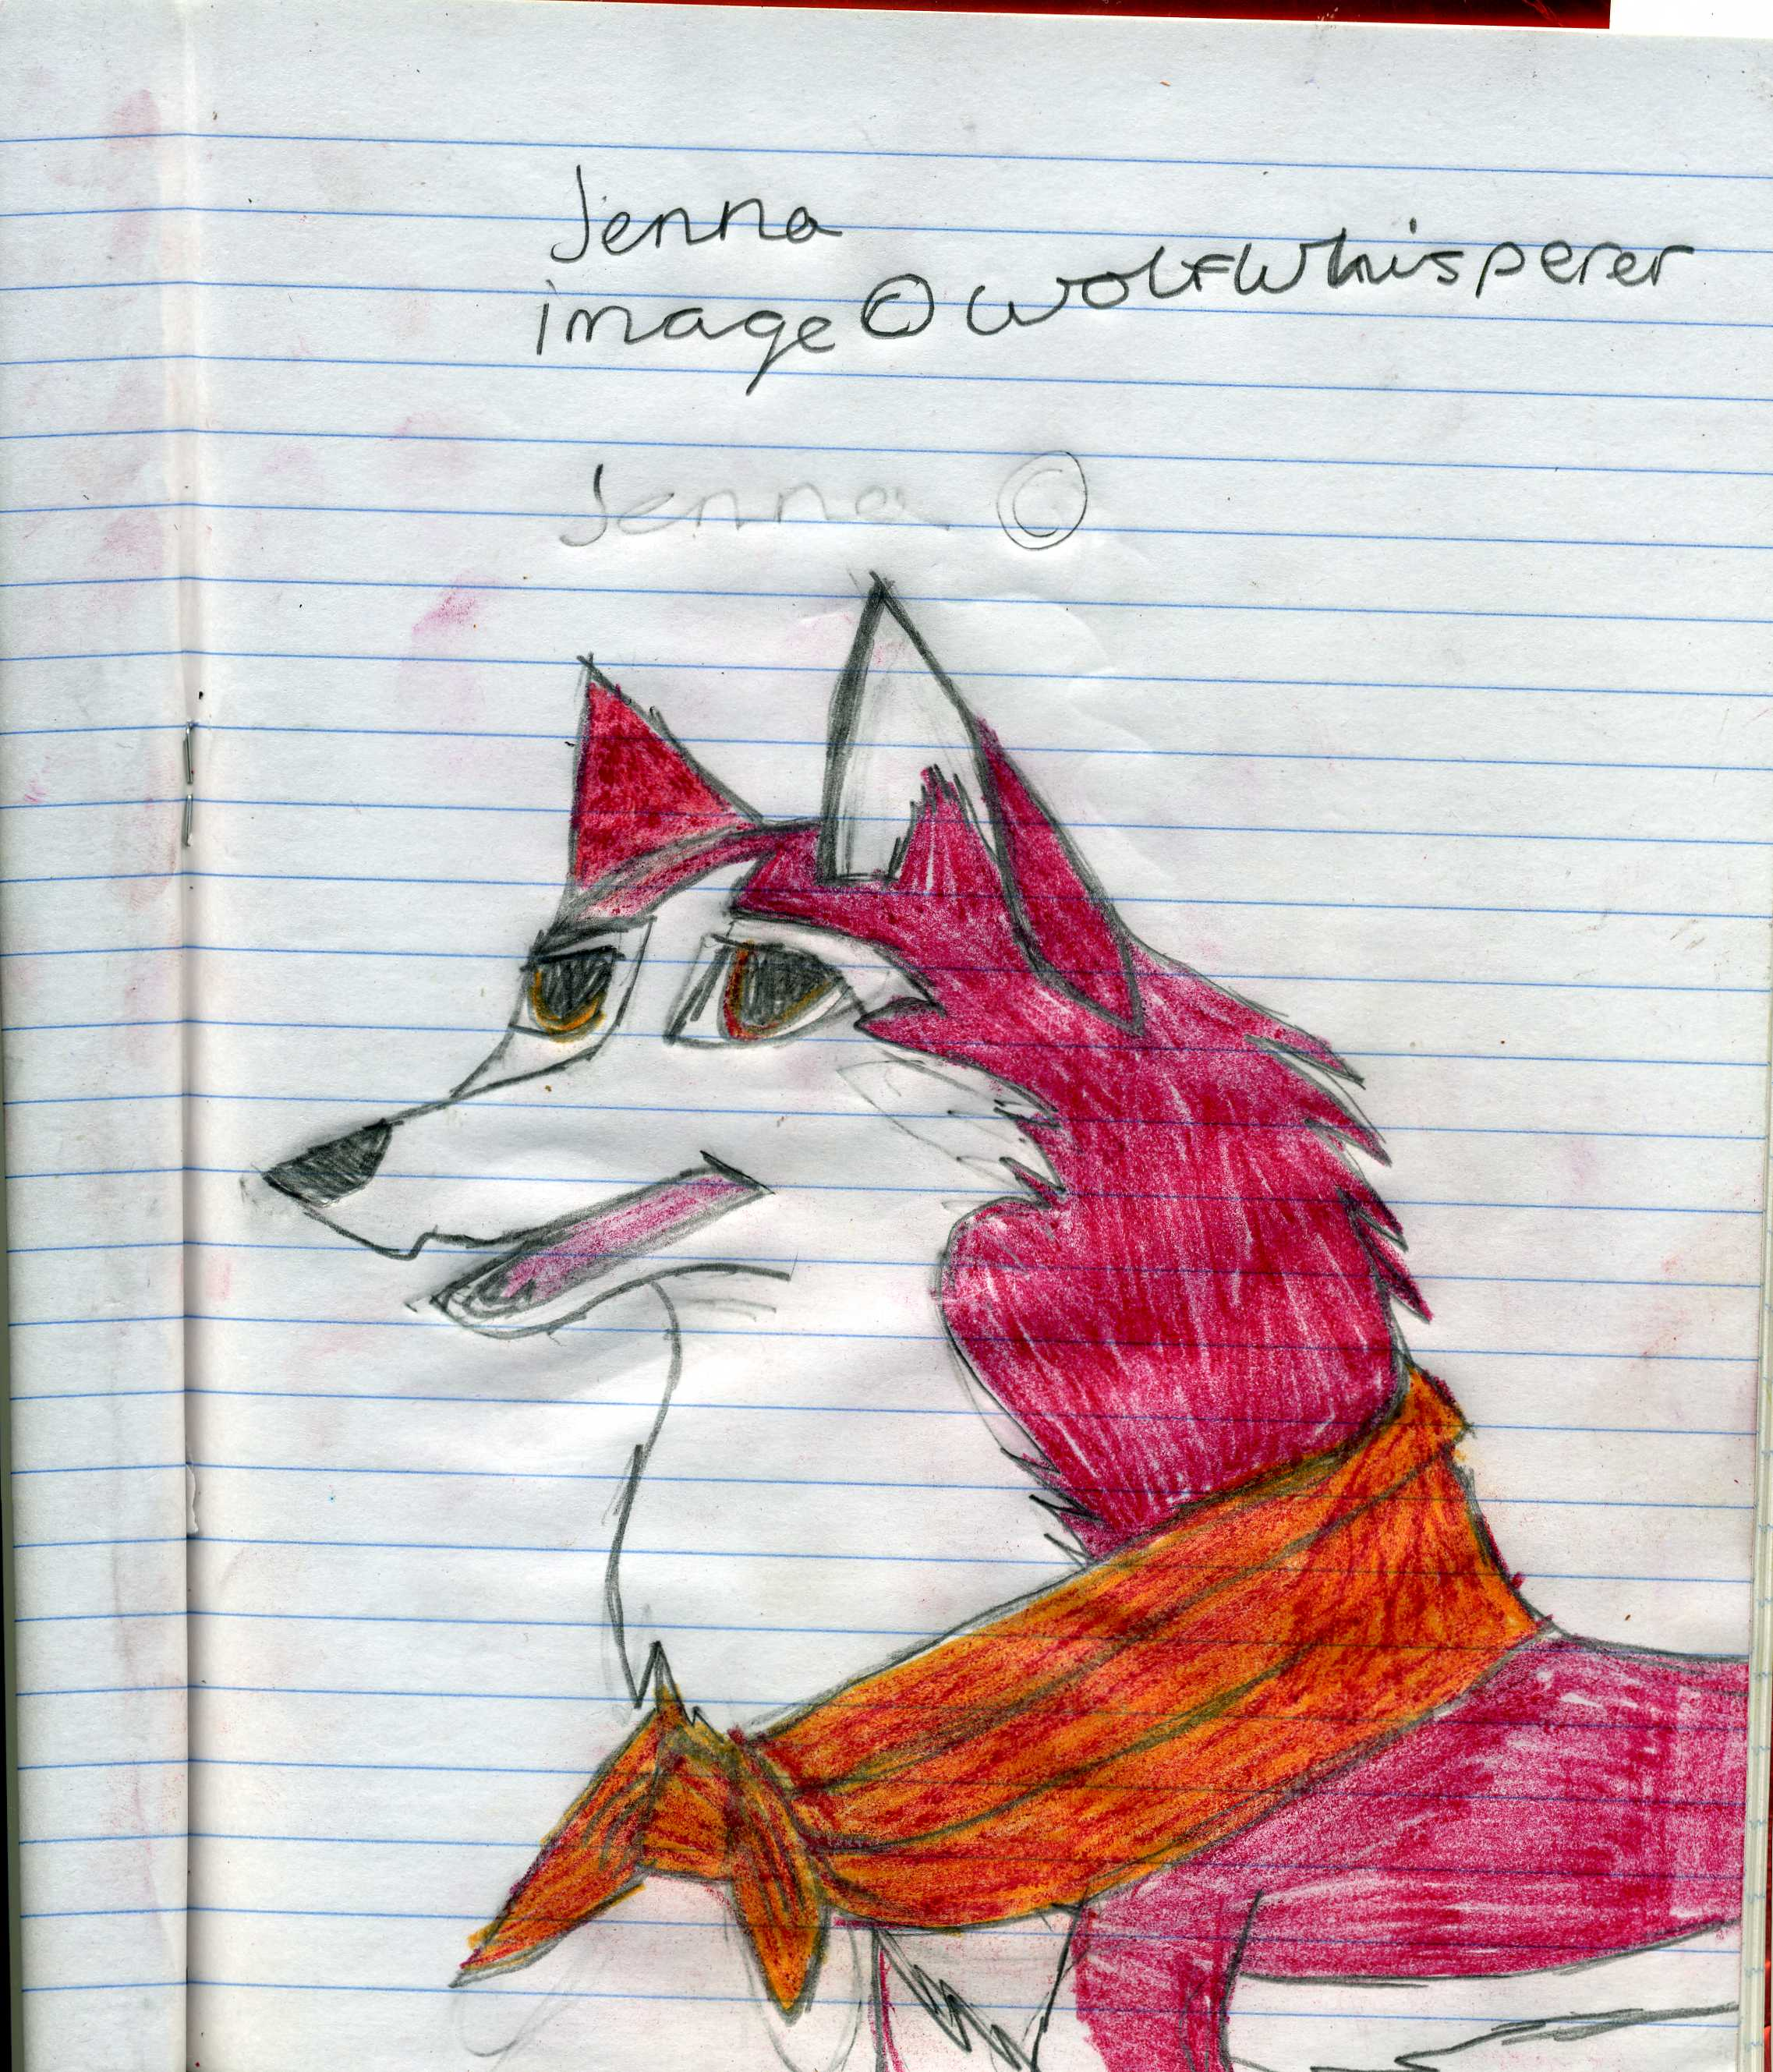 jenna by wolfwhisperer